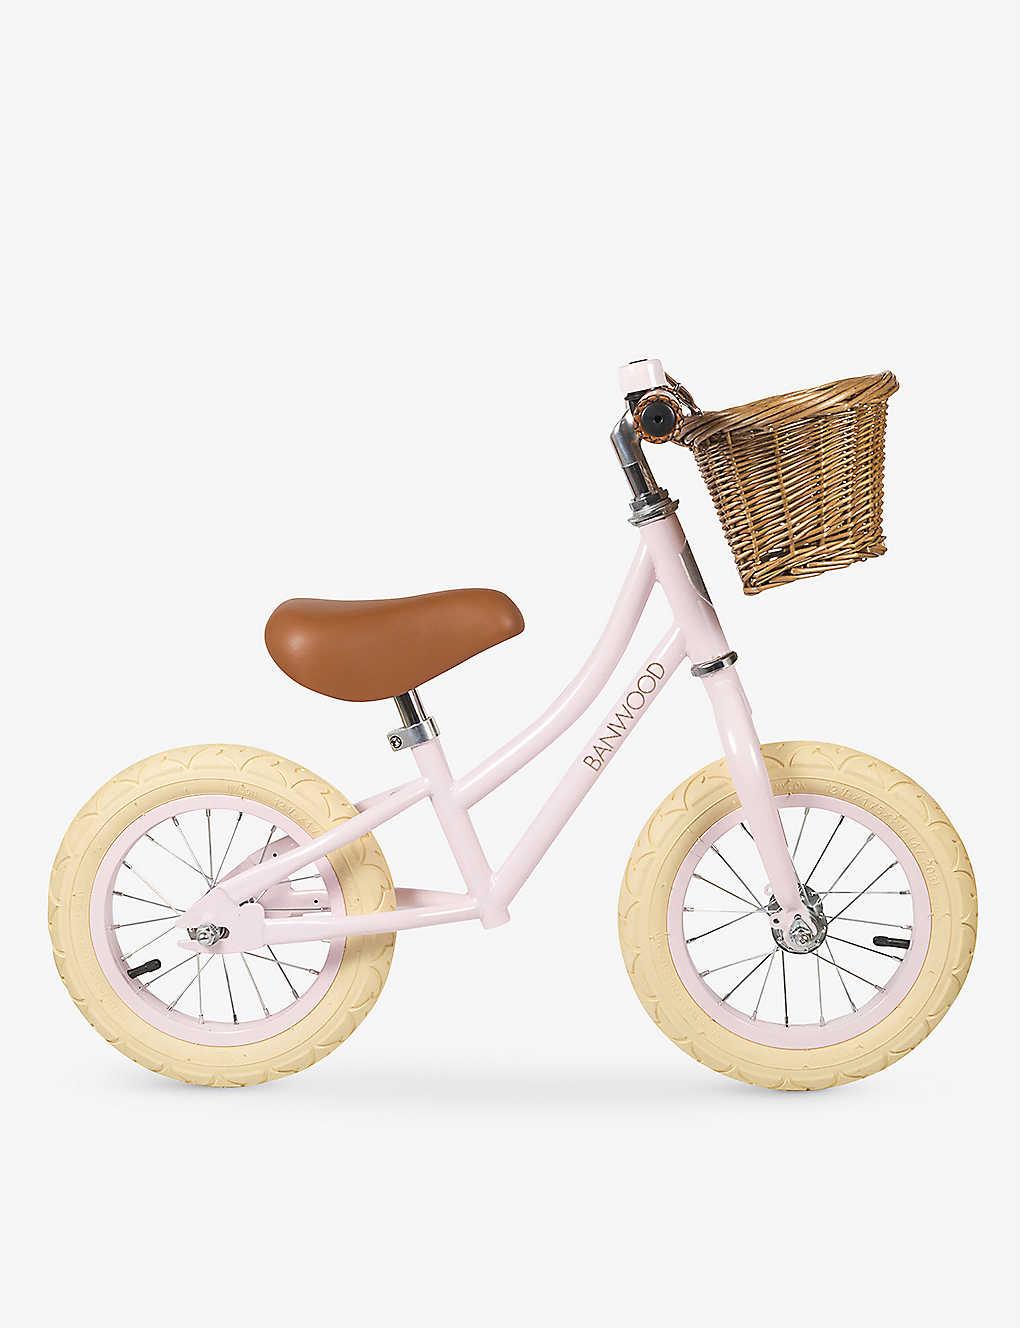 067dbde3d24 Balance toddler push bike; First Go! Balance toddler push bike ...